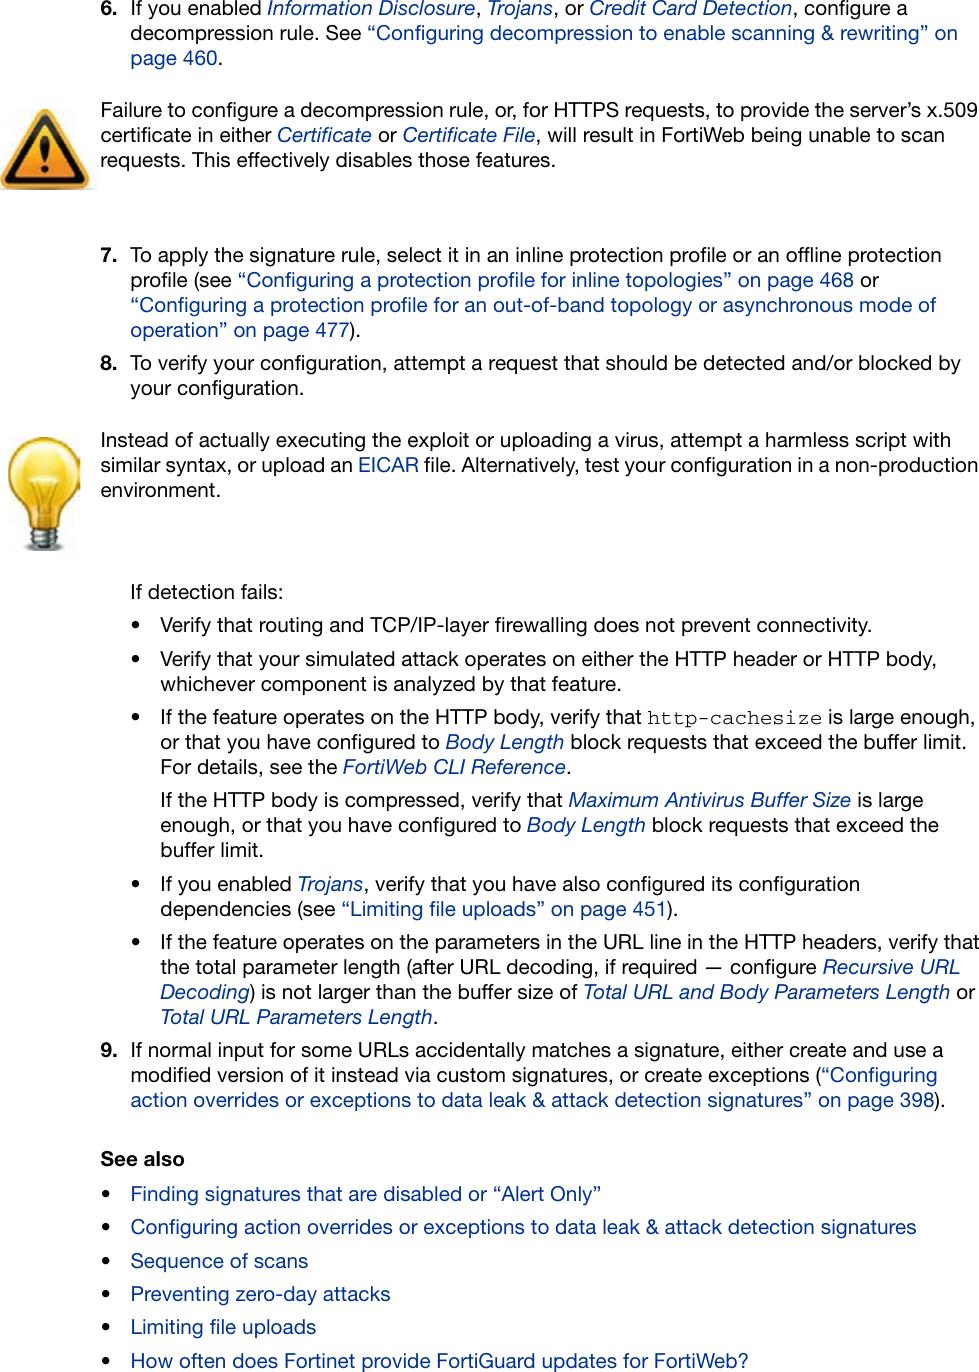 Fortigate Python Script